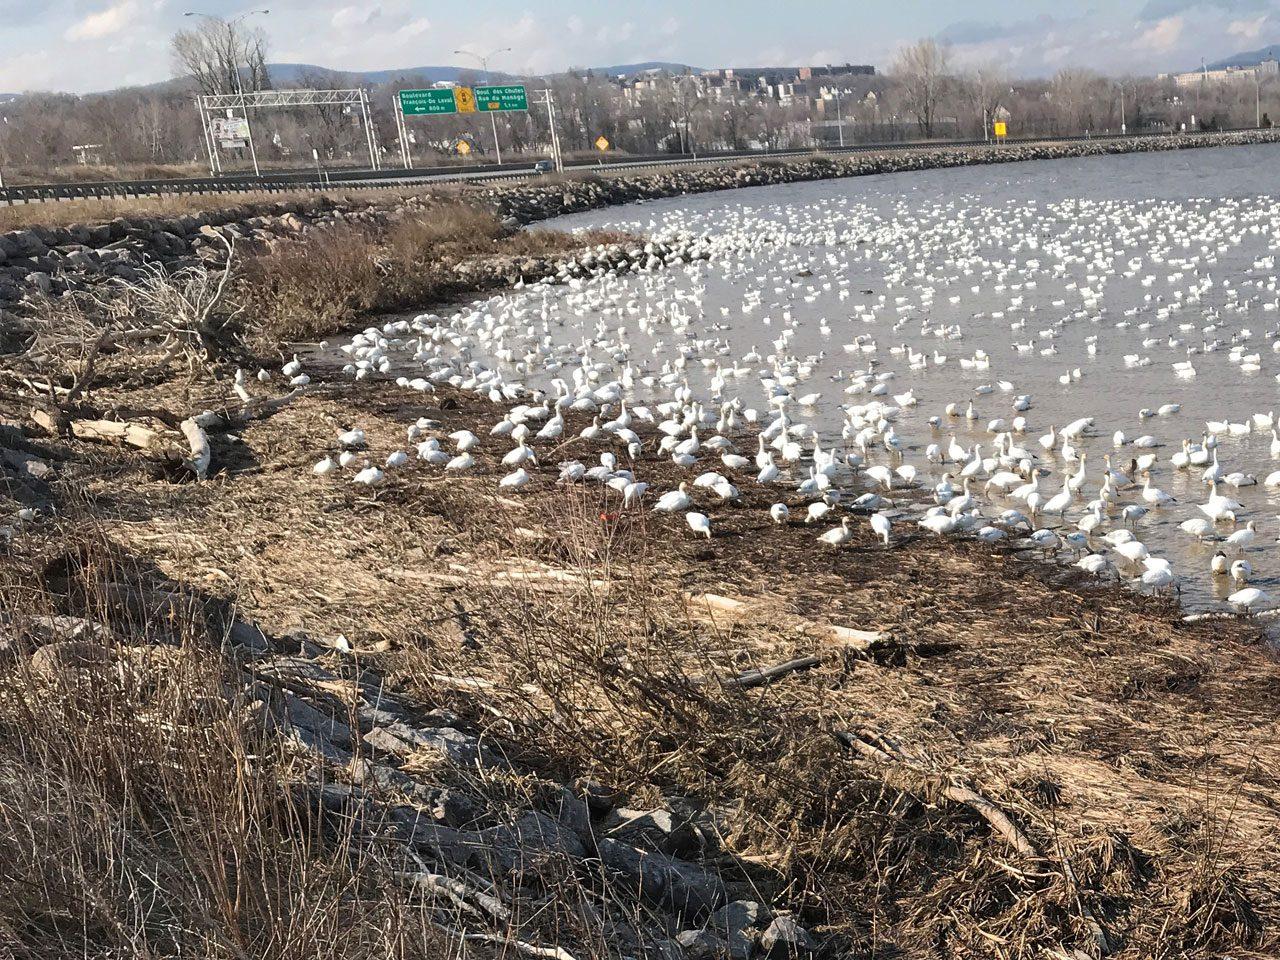 Waterfowl Habitat in Quebec, spring 2020